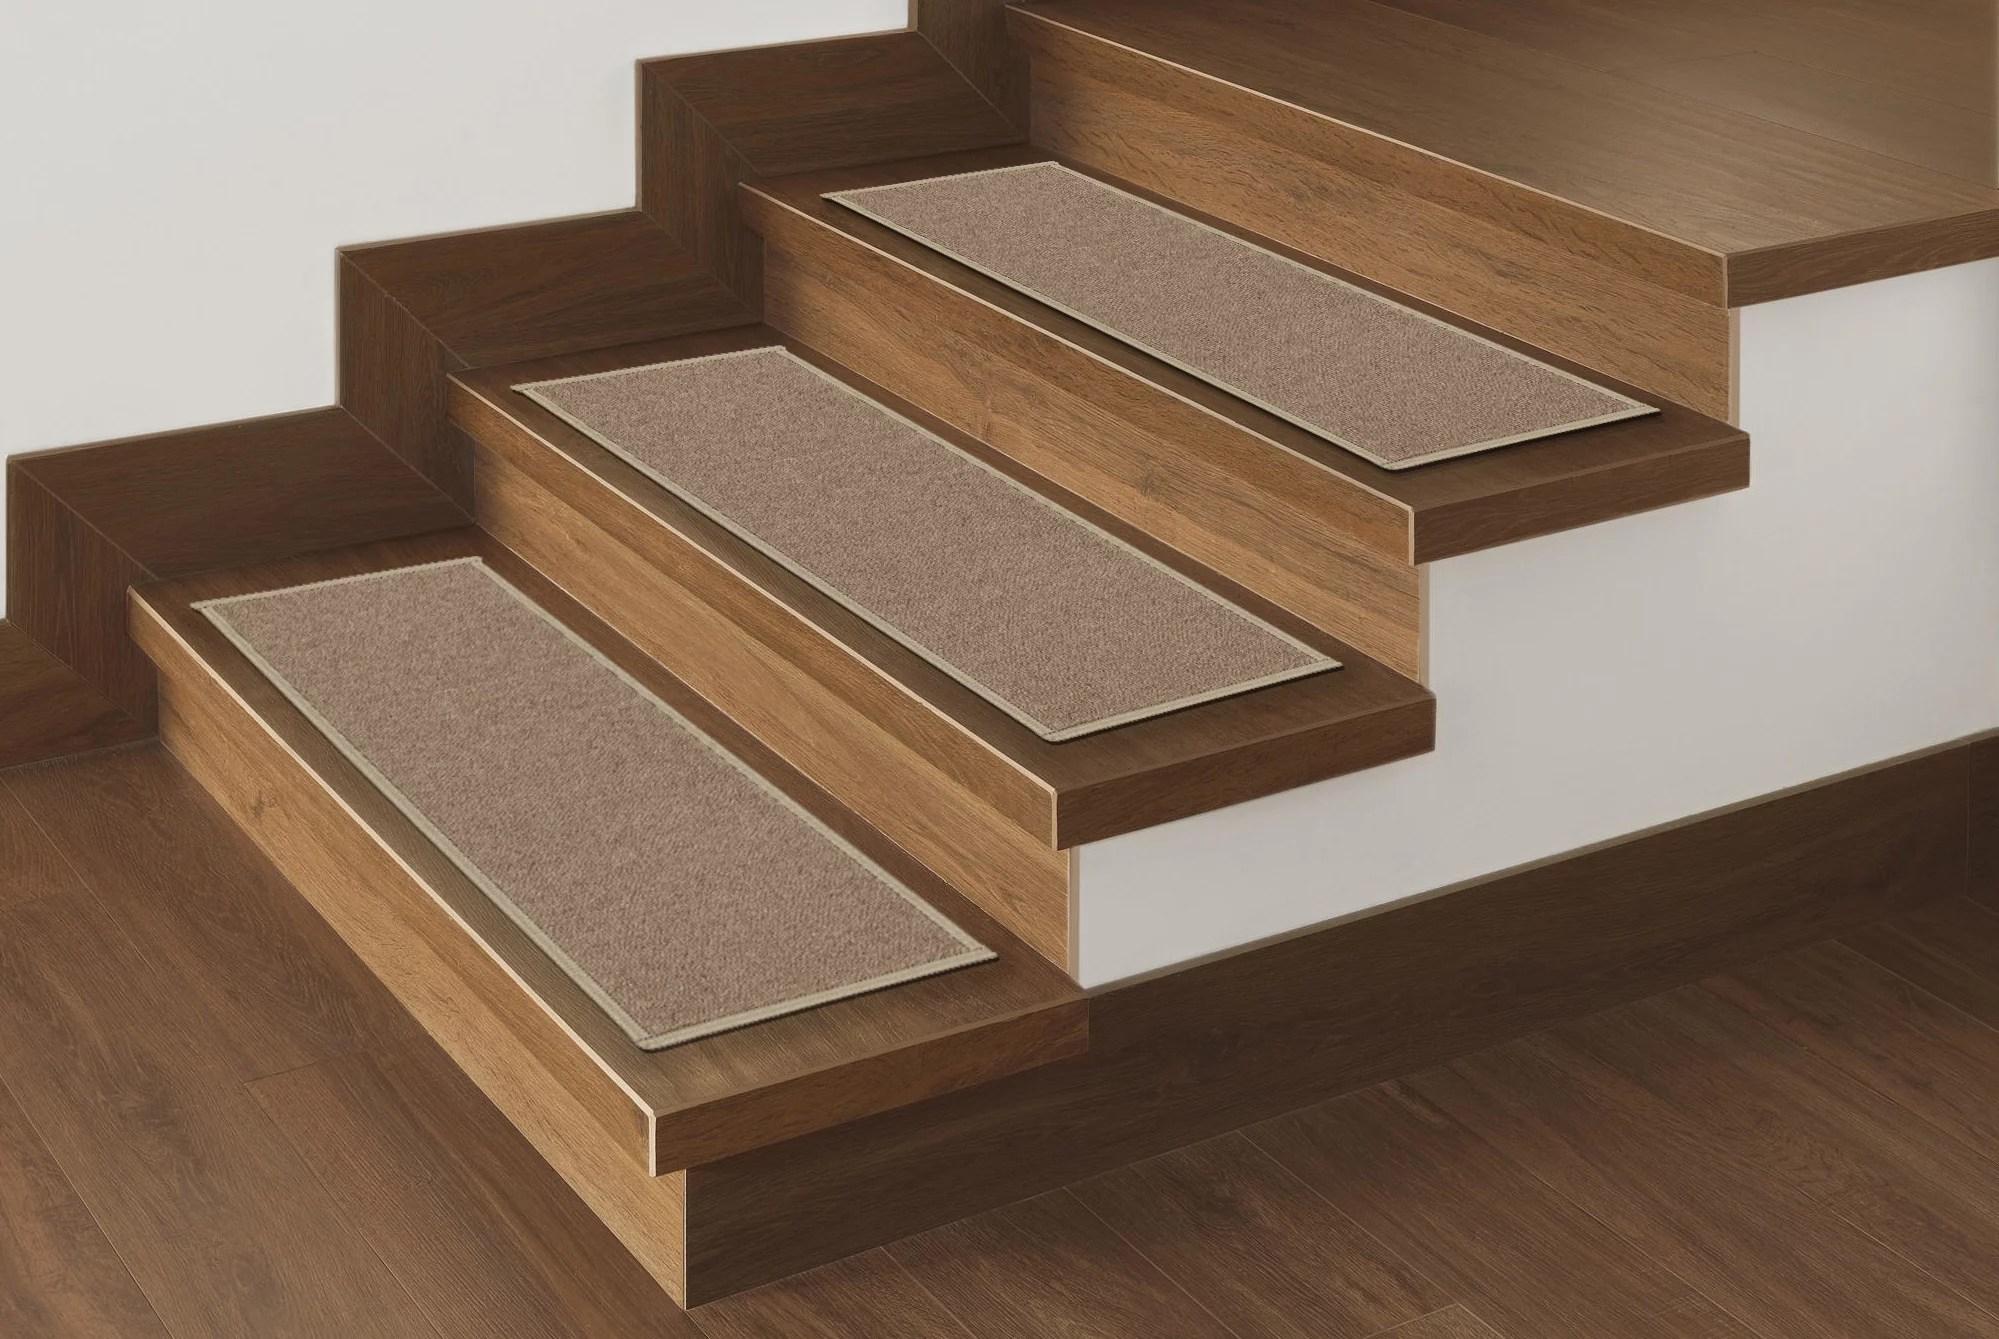 Ottomanson Non Slip Rubber Backing Stair Tread Dark Beige 8 5 X | Dark Carpet On Stairs | Gray | Monochrome | Wall | Modern | Metal Bar On Stair